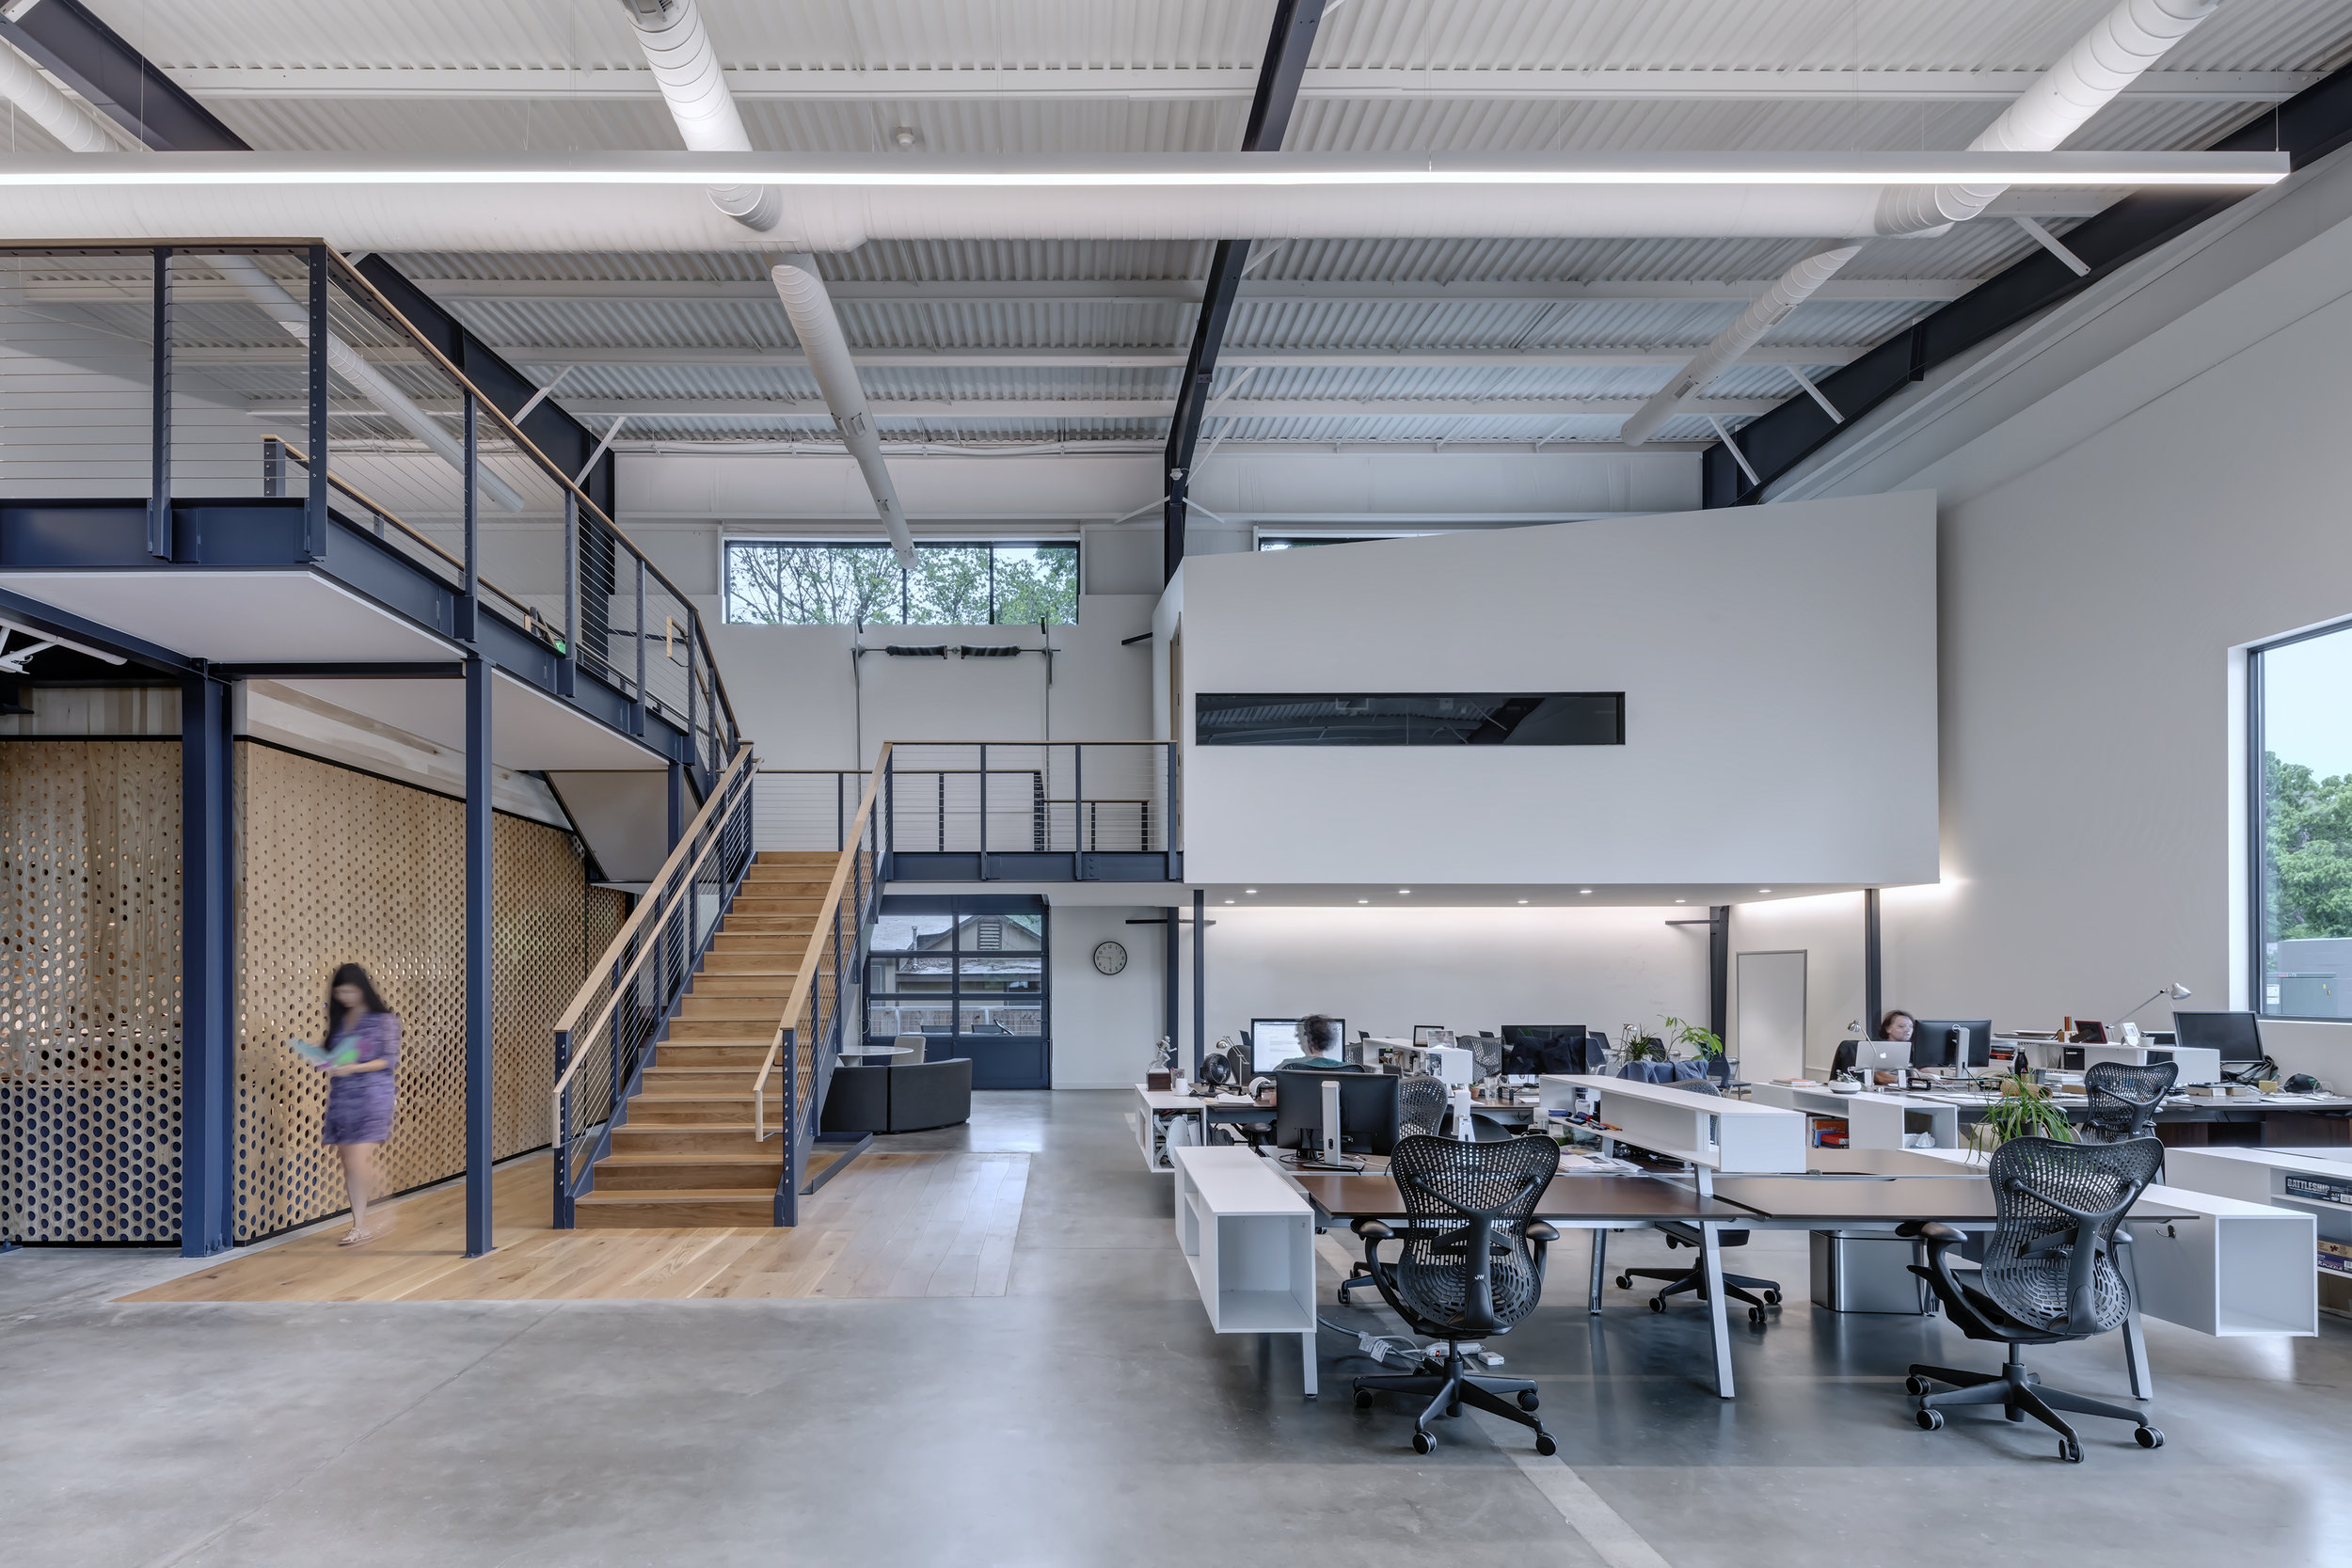 JDI Office by Matt Fajkus MF Architecture. Photo 1 by Charles Davis Smith.jpg